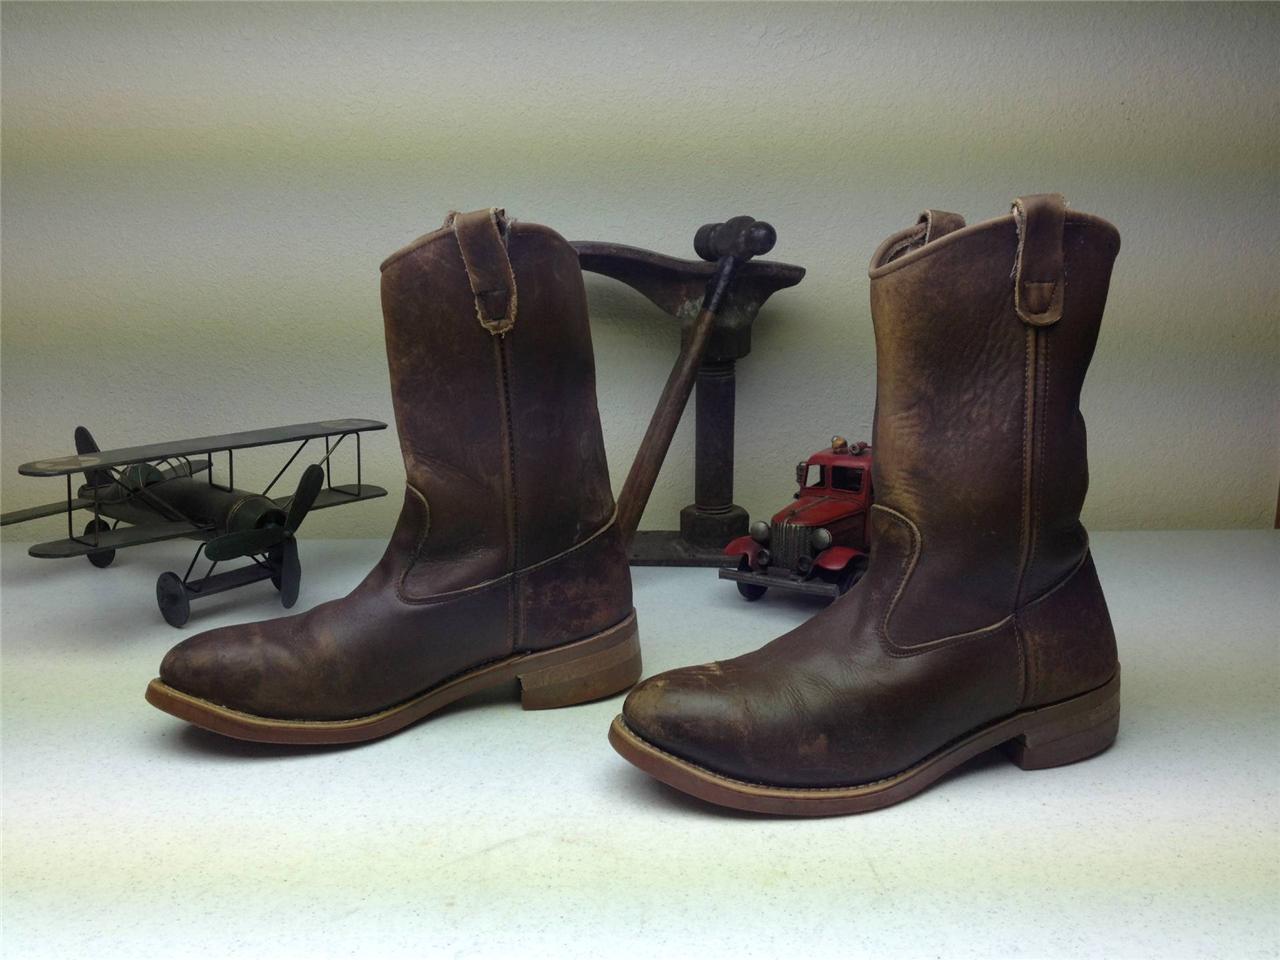 Marrón Envejecido Usa Santa Fe Ingeniero Motocicleta acero dedo botas de trabajo Tamaño D 10